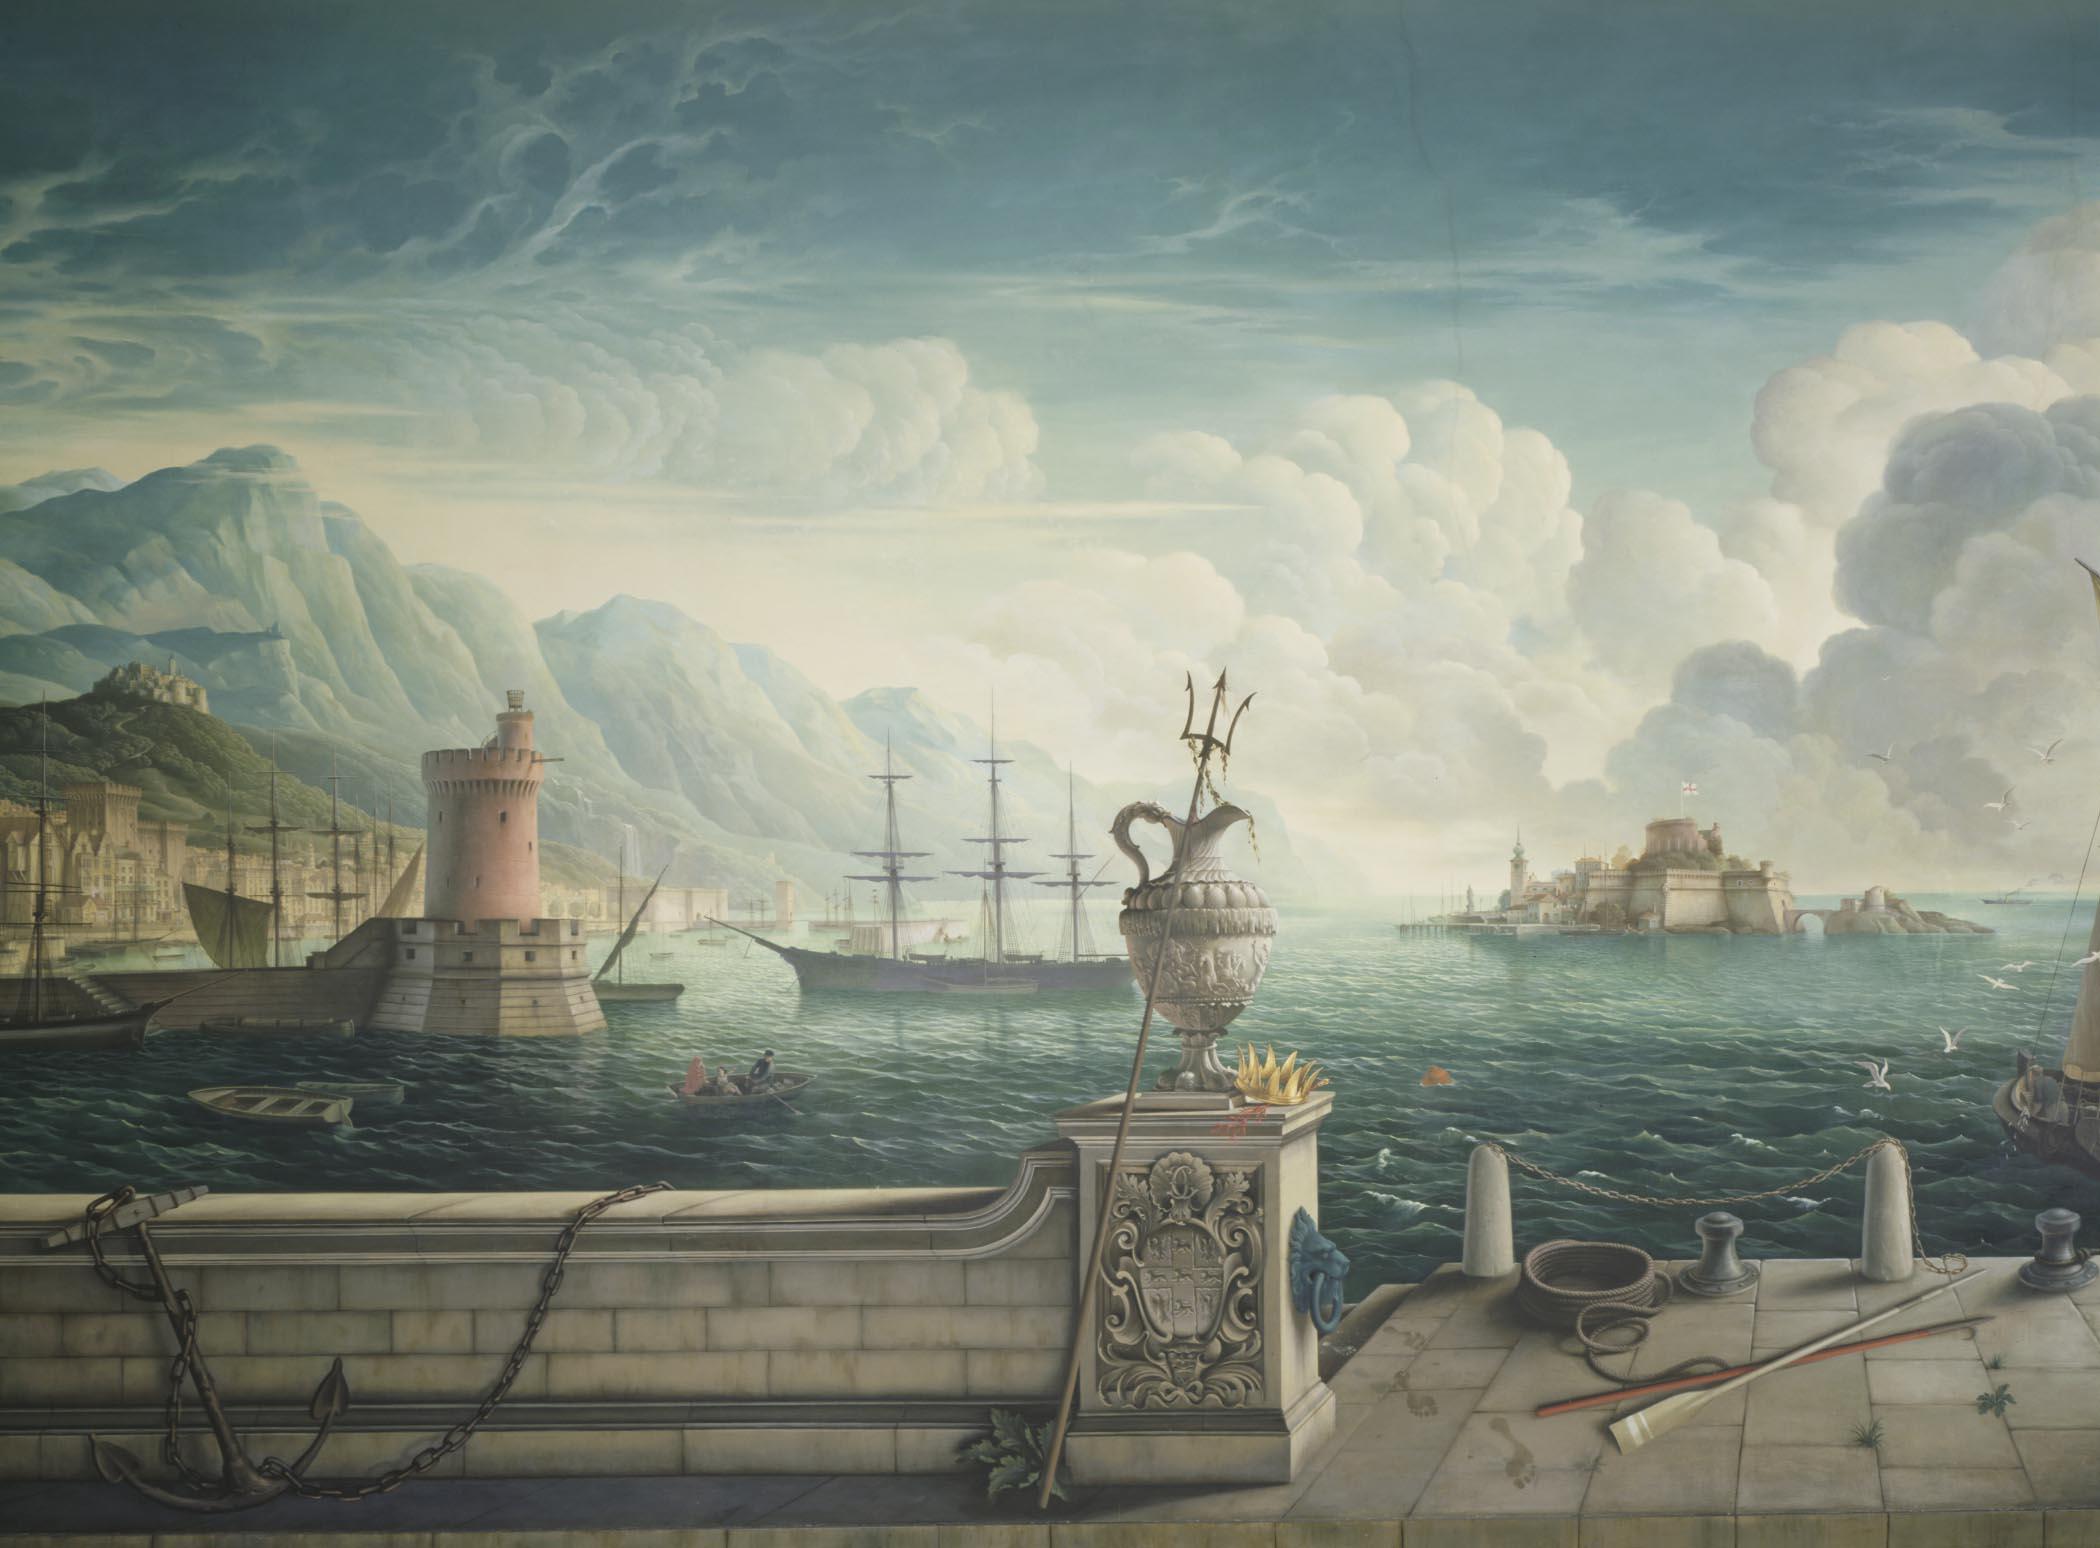 Plas Newydd Whistler mural